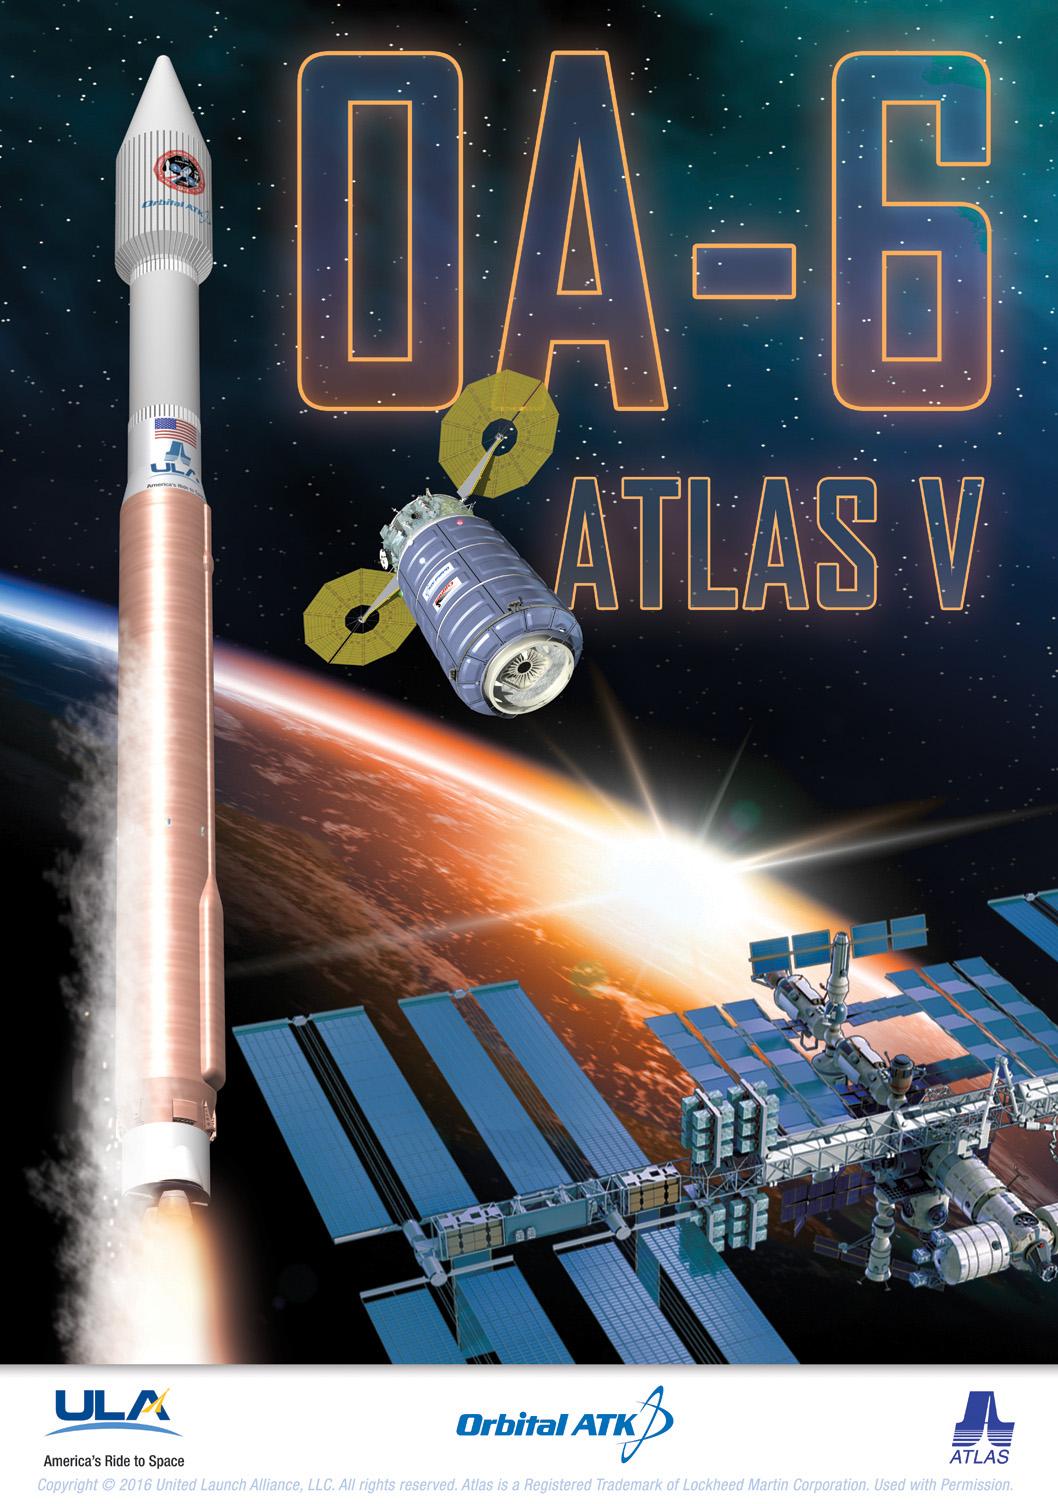 http://spaceflightnow.com/wp-content/uploads/2016/02/OA6.jpg